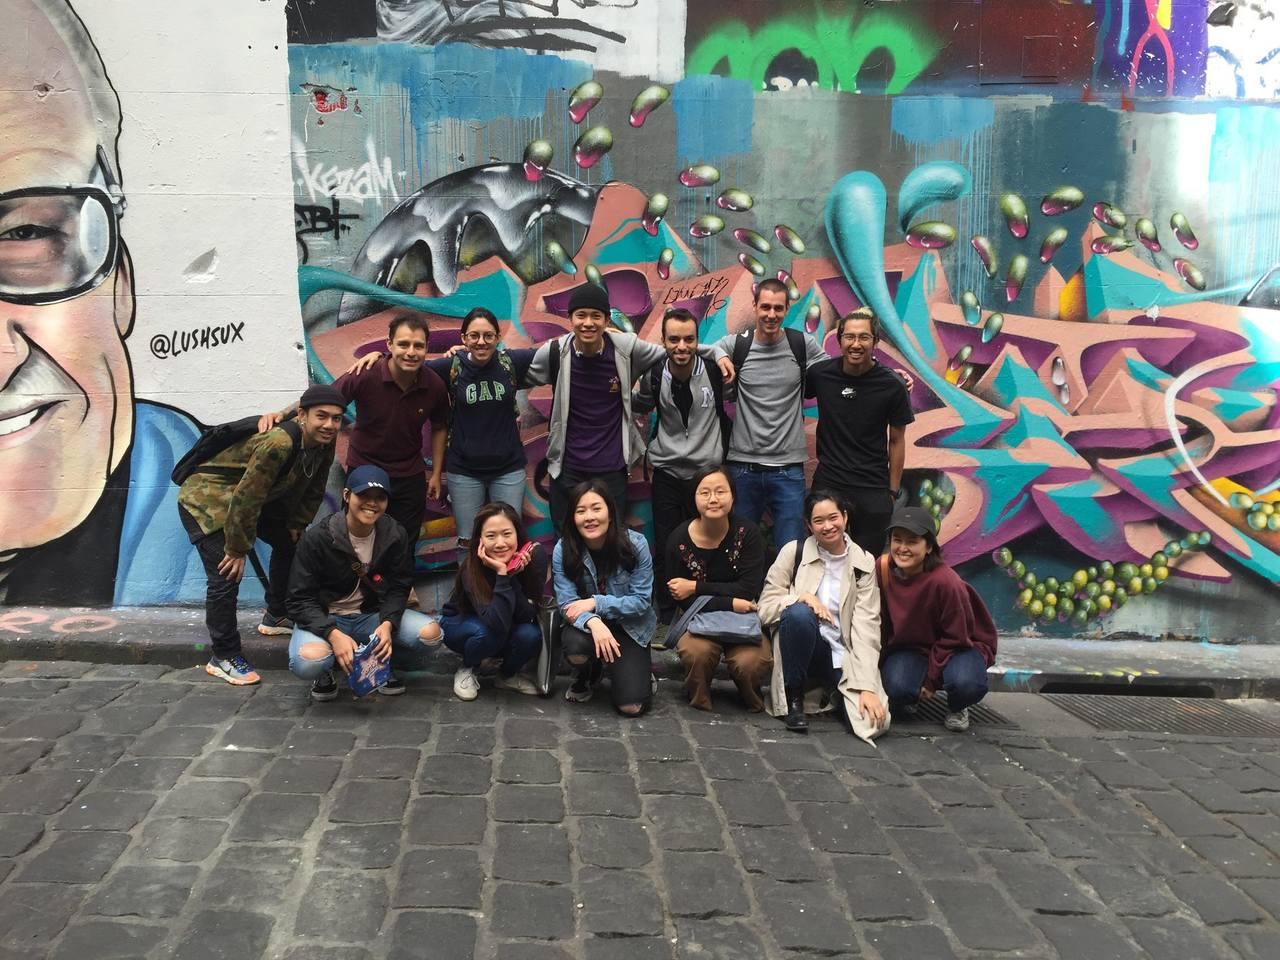 Street art, Graffiti, Social group, Art, Wall, Mural, Snapshot, Youth, Urban area, Eyewear, Photography, Glasses, Visual arts, Street, Leisure